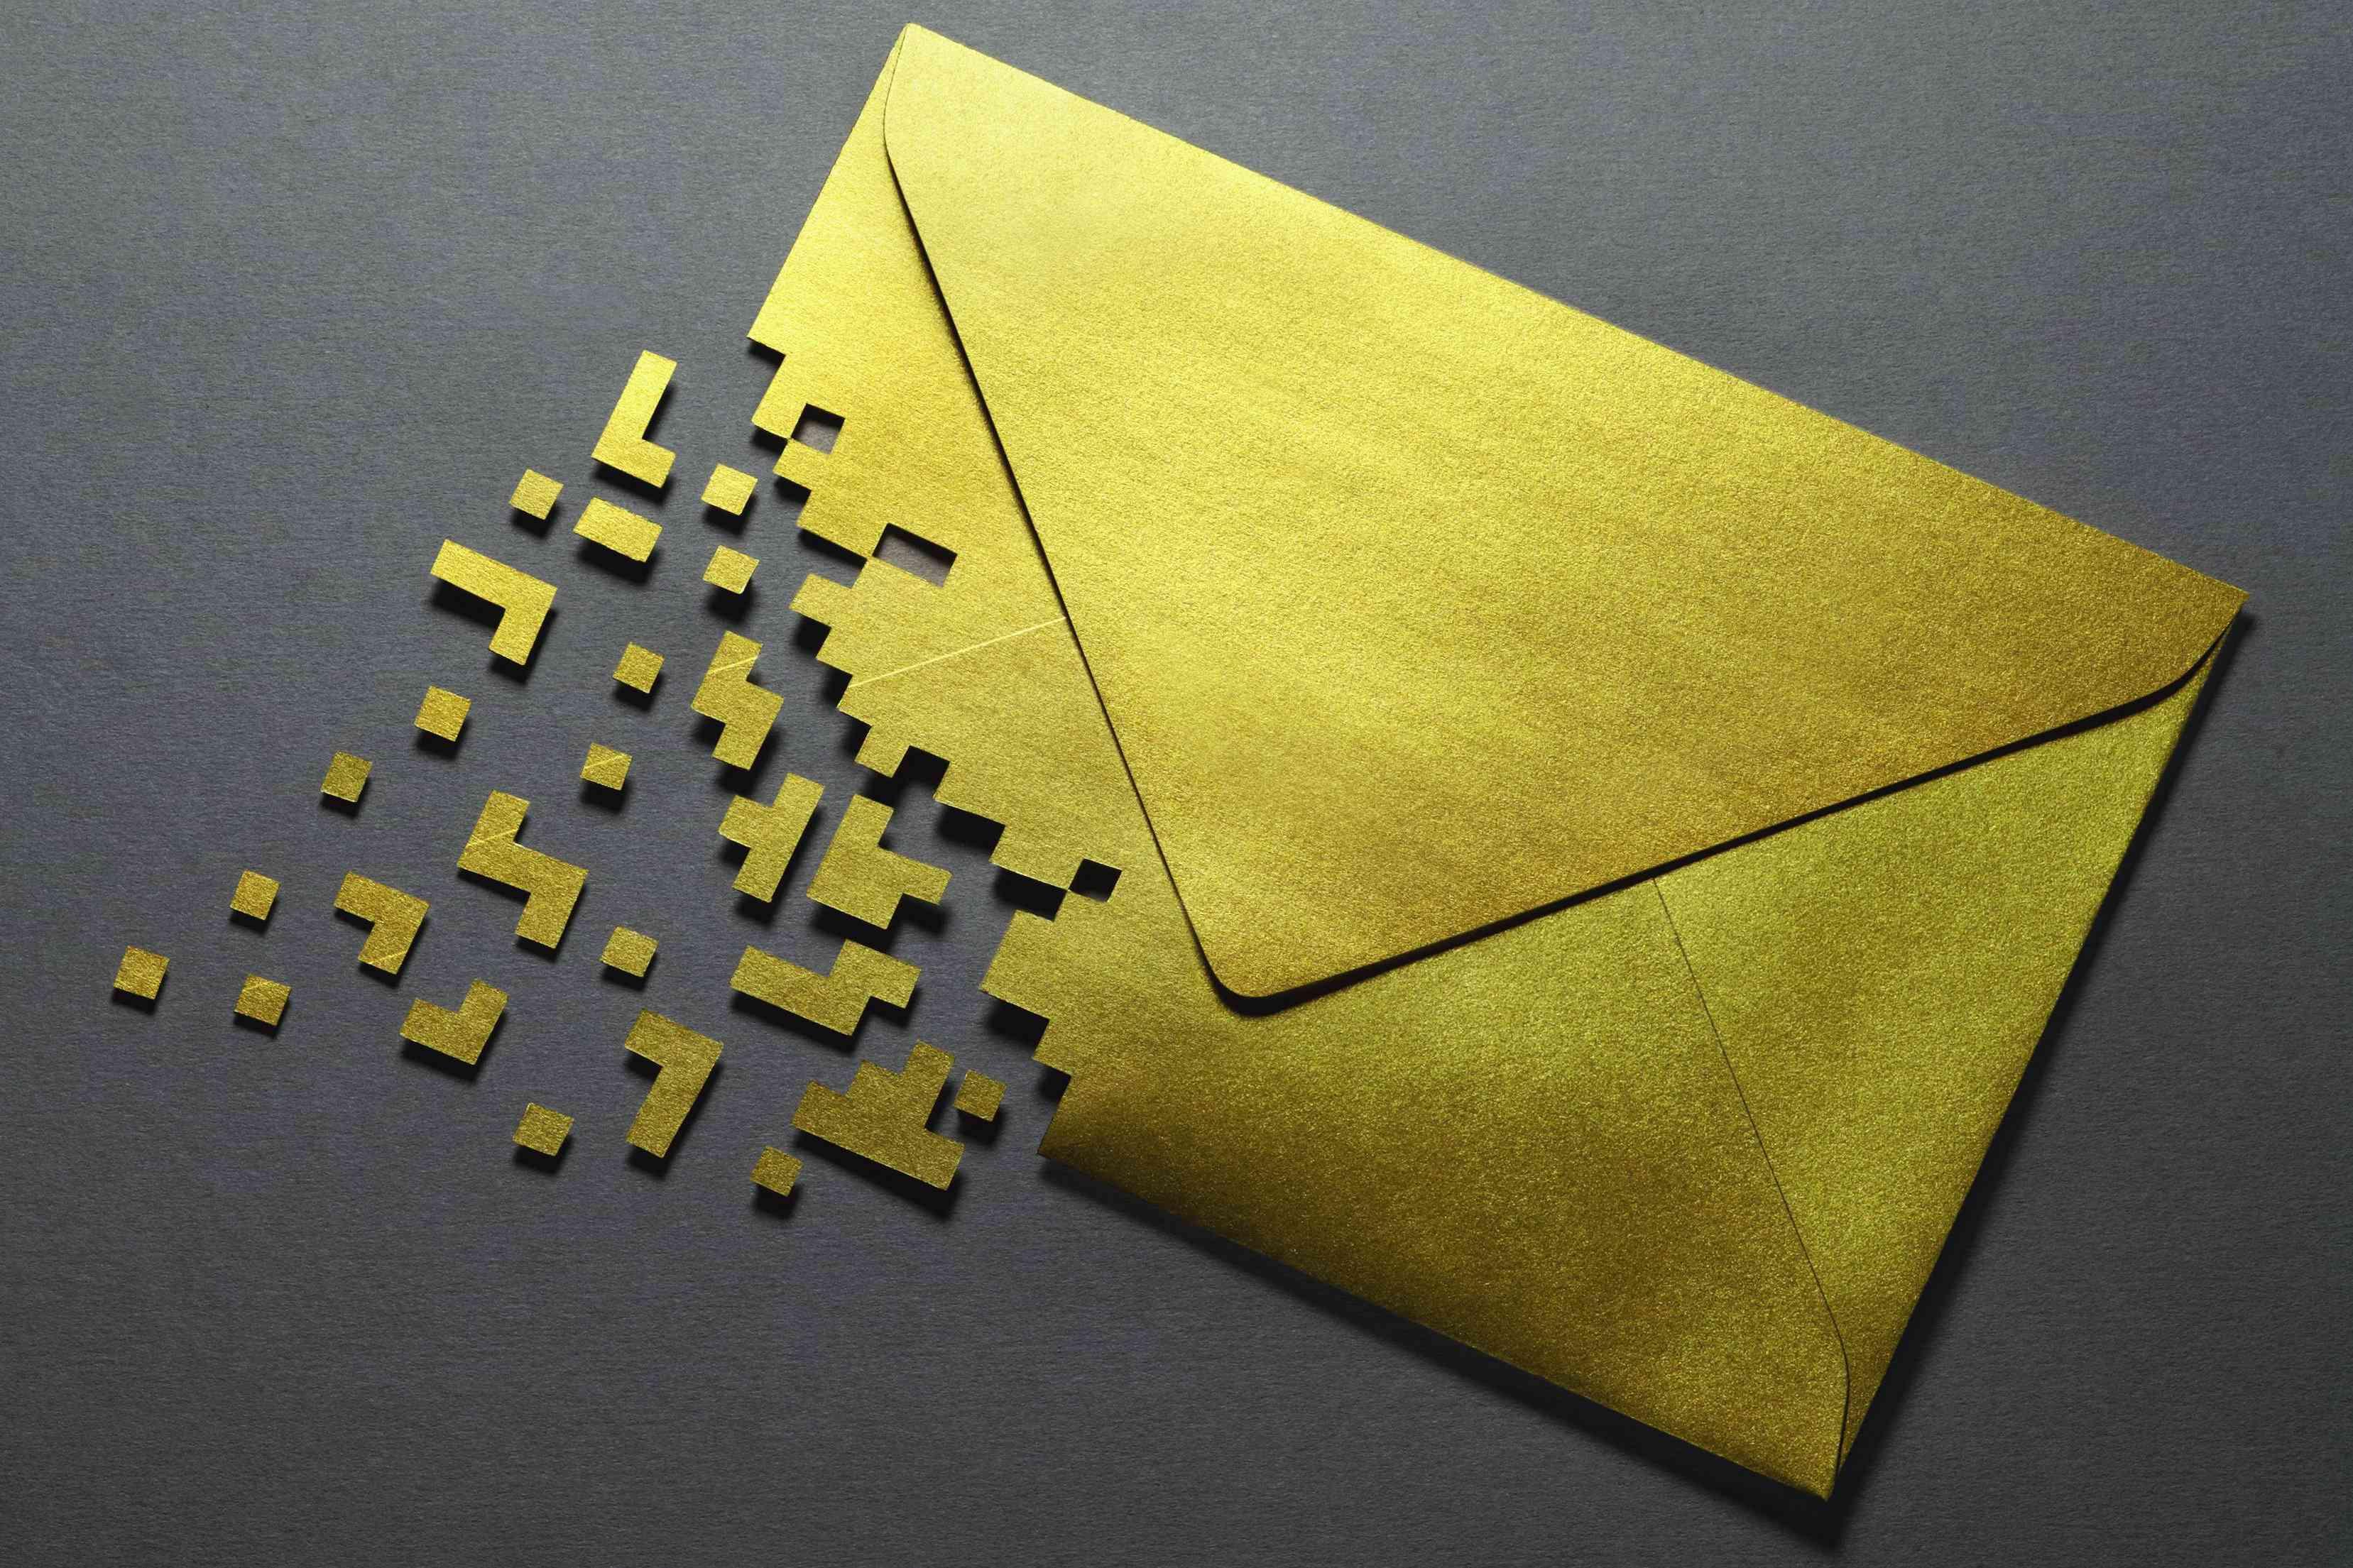 Half pixilated envelope representing email.